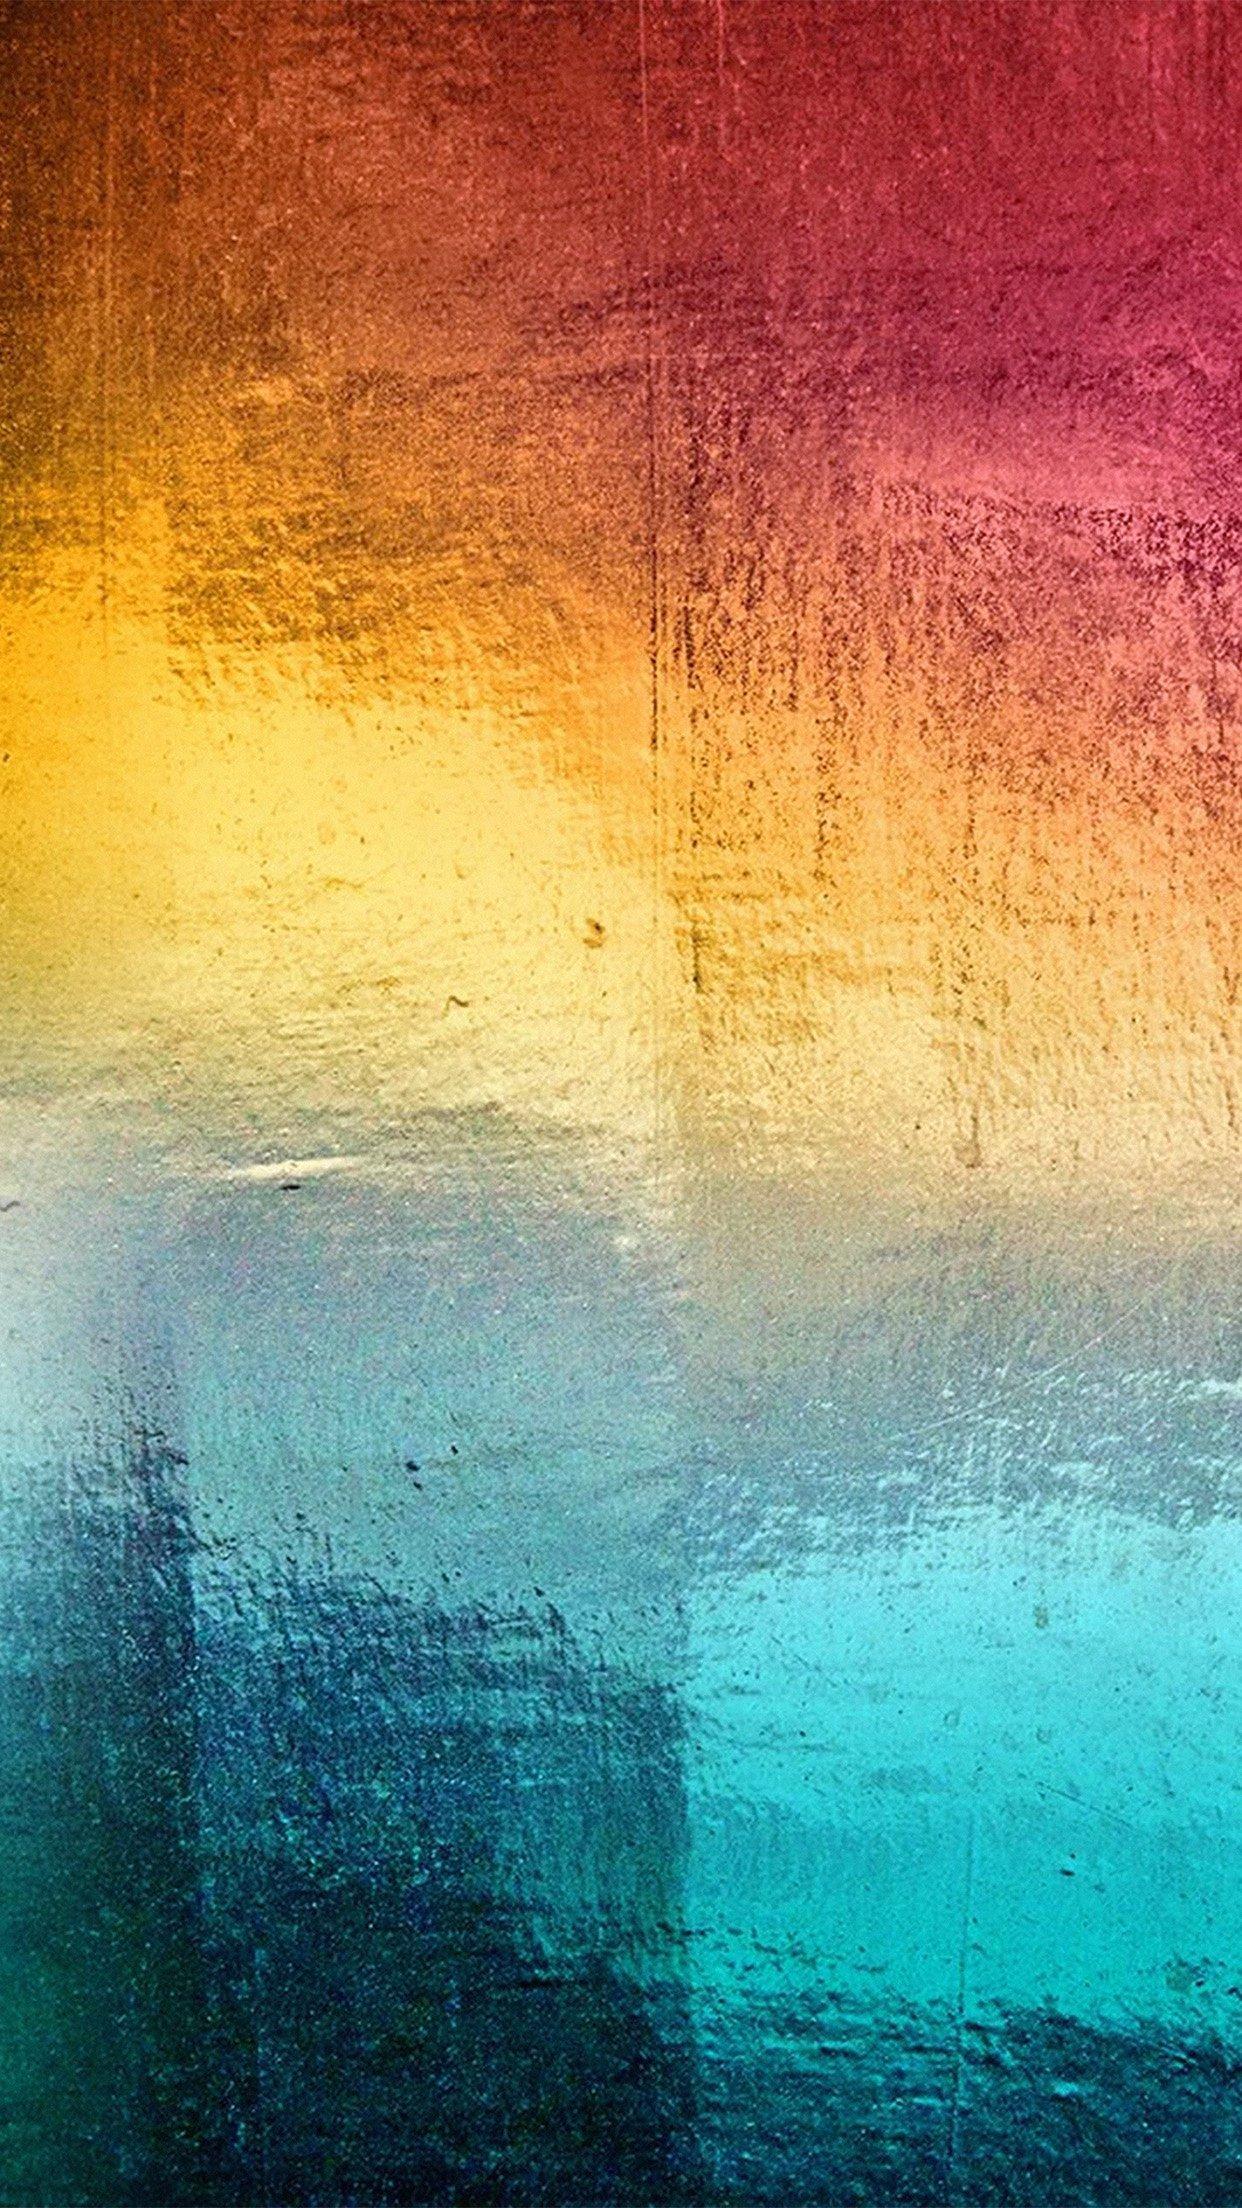 Unduh 470+ Wallpaper Hd Samsung S10 HD Terbaru